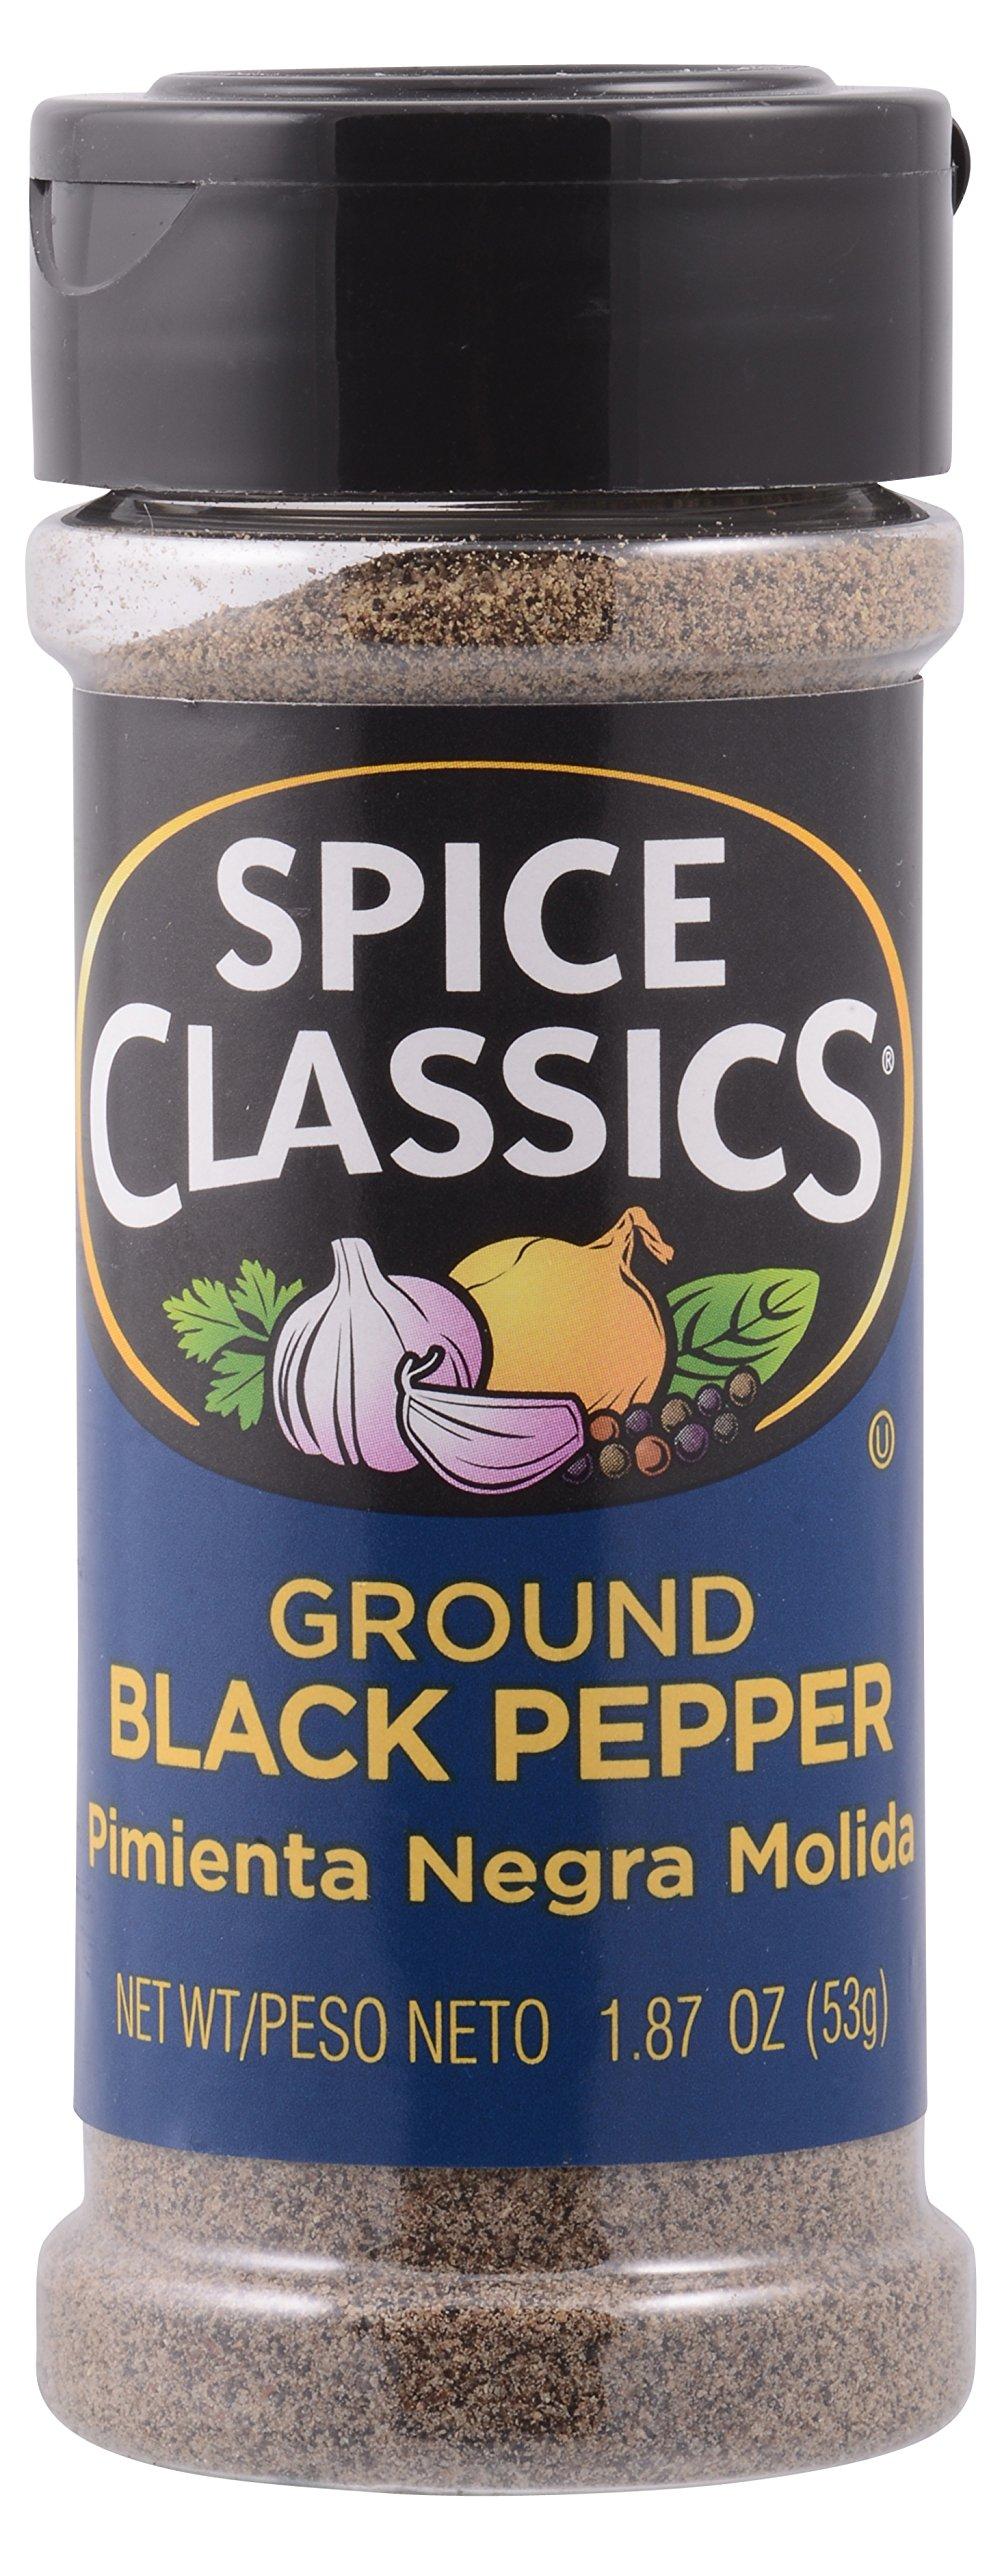 Spice Classics ground black pepper, 1.87-oz., plastic shaker (Pack of 1)